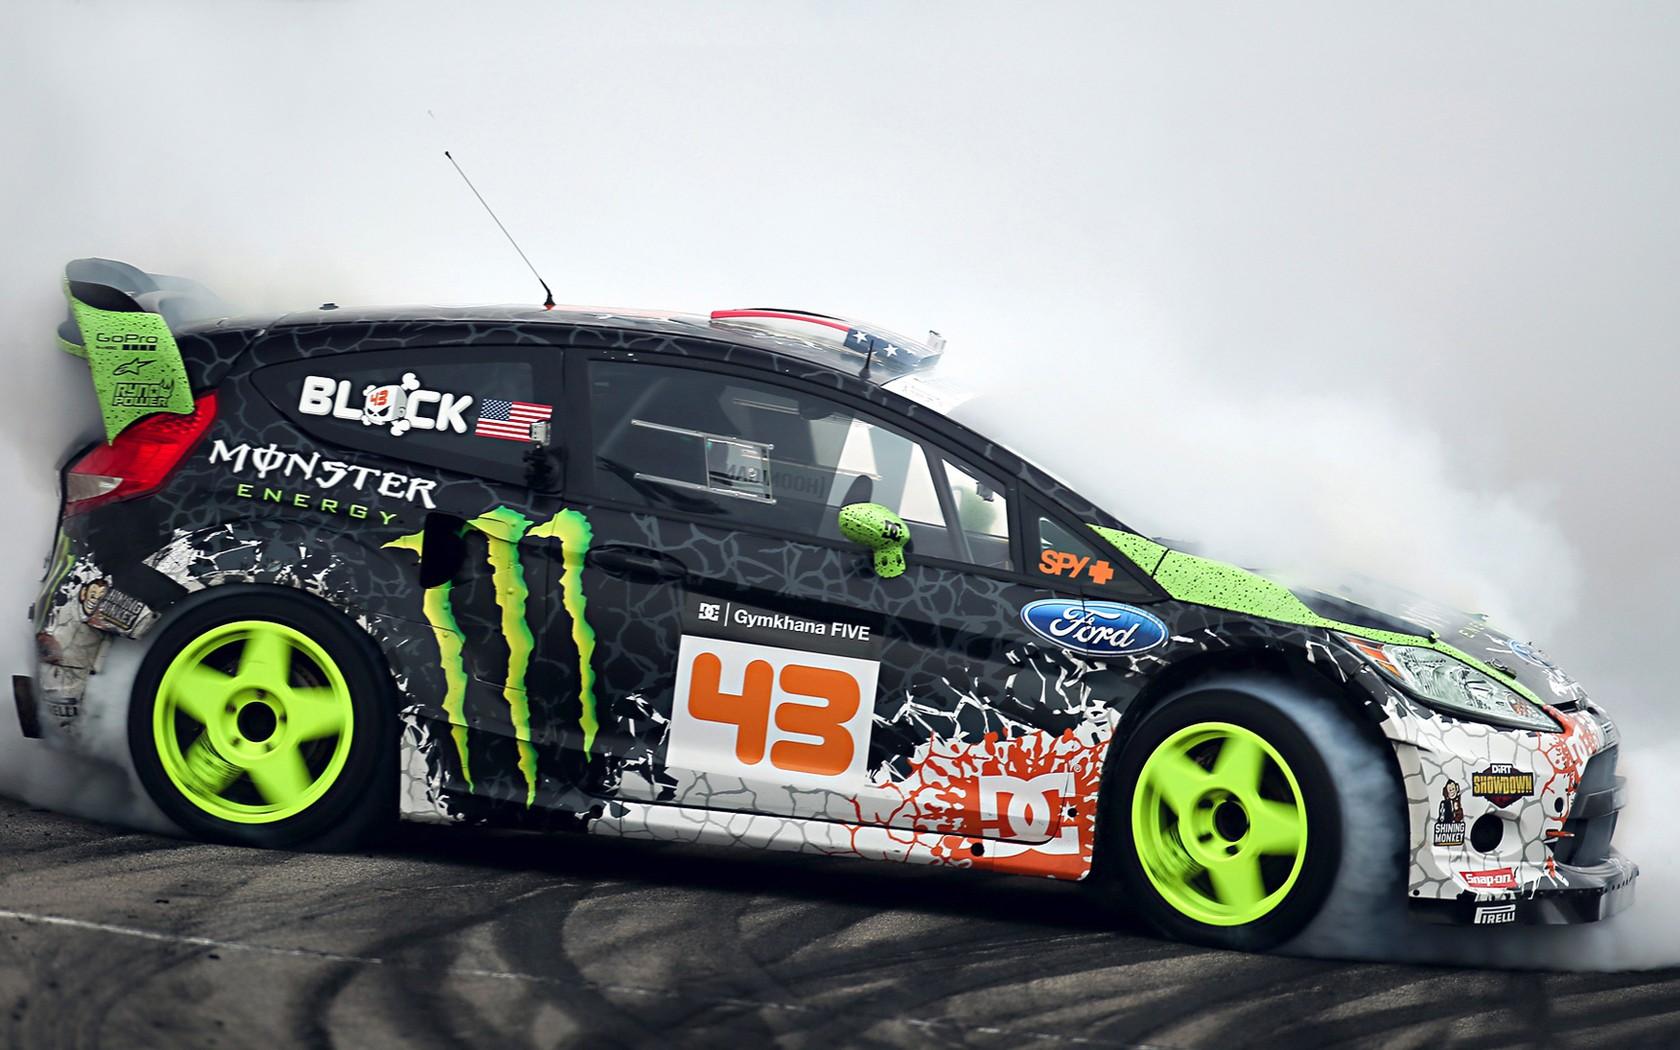 Ford Ken Block Ford Fiesta Monster Energy drifting drift wallpaper 1680x1050